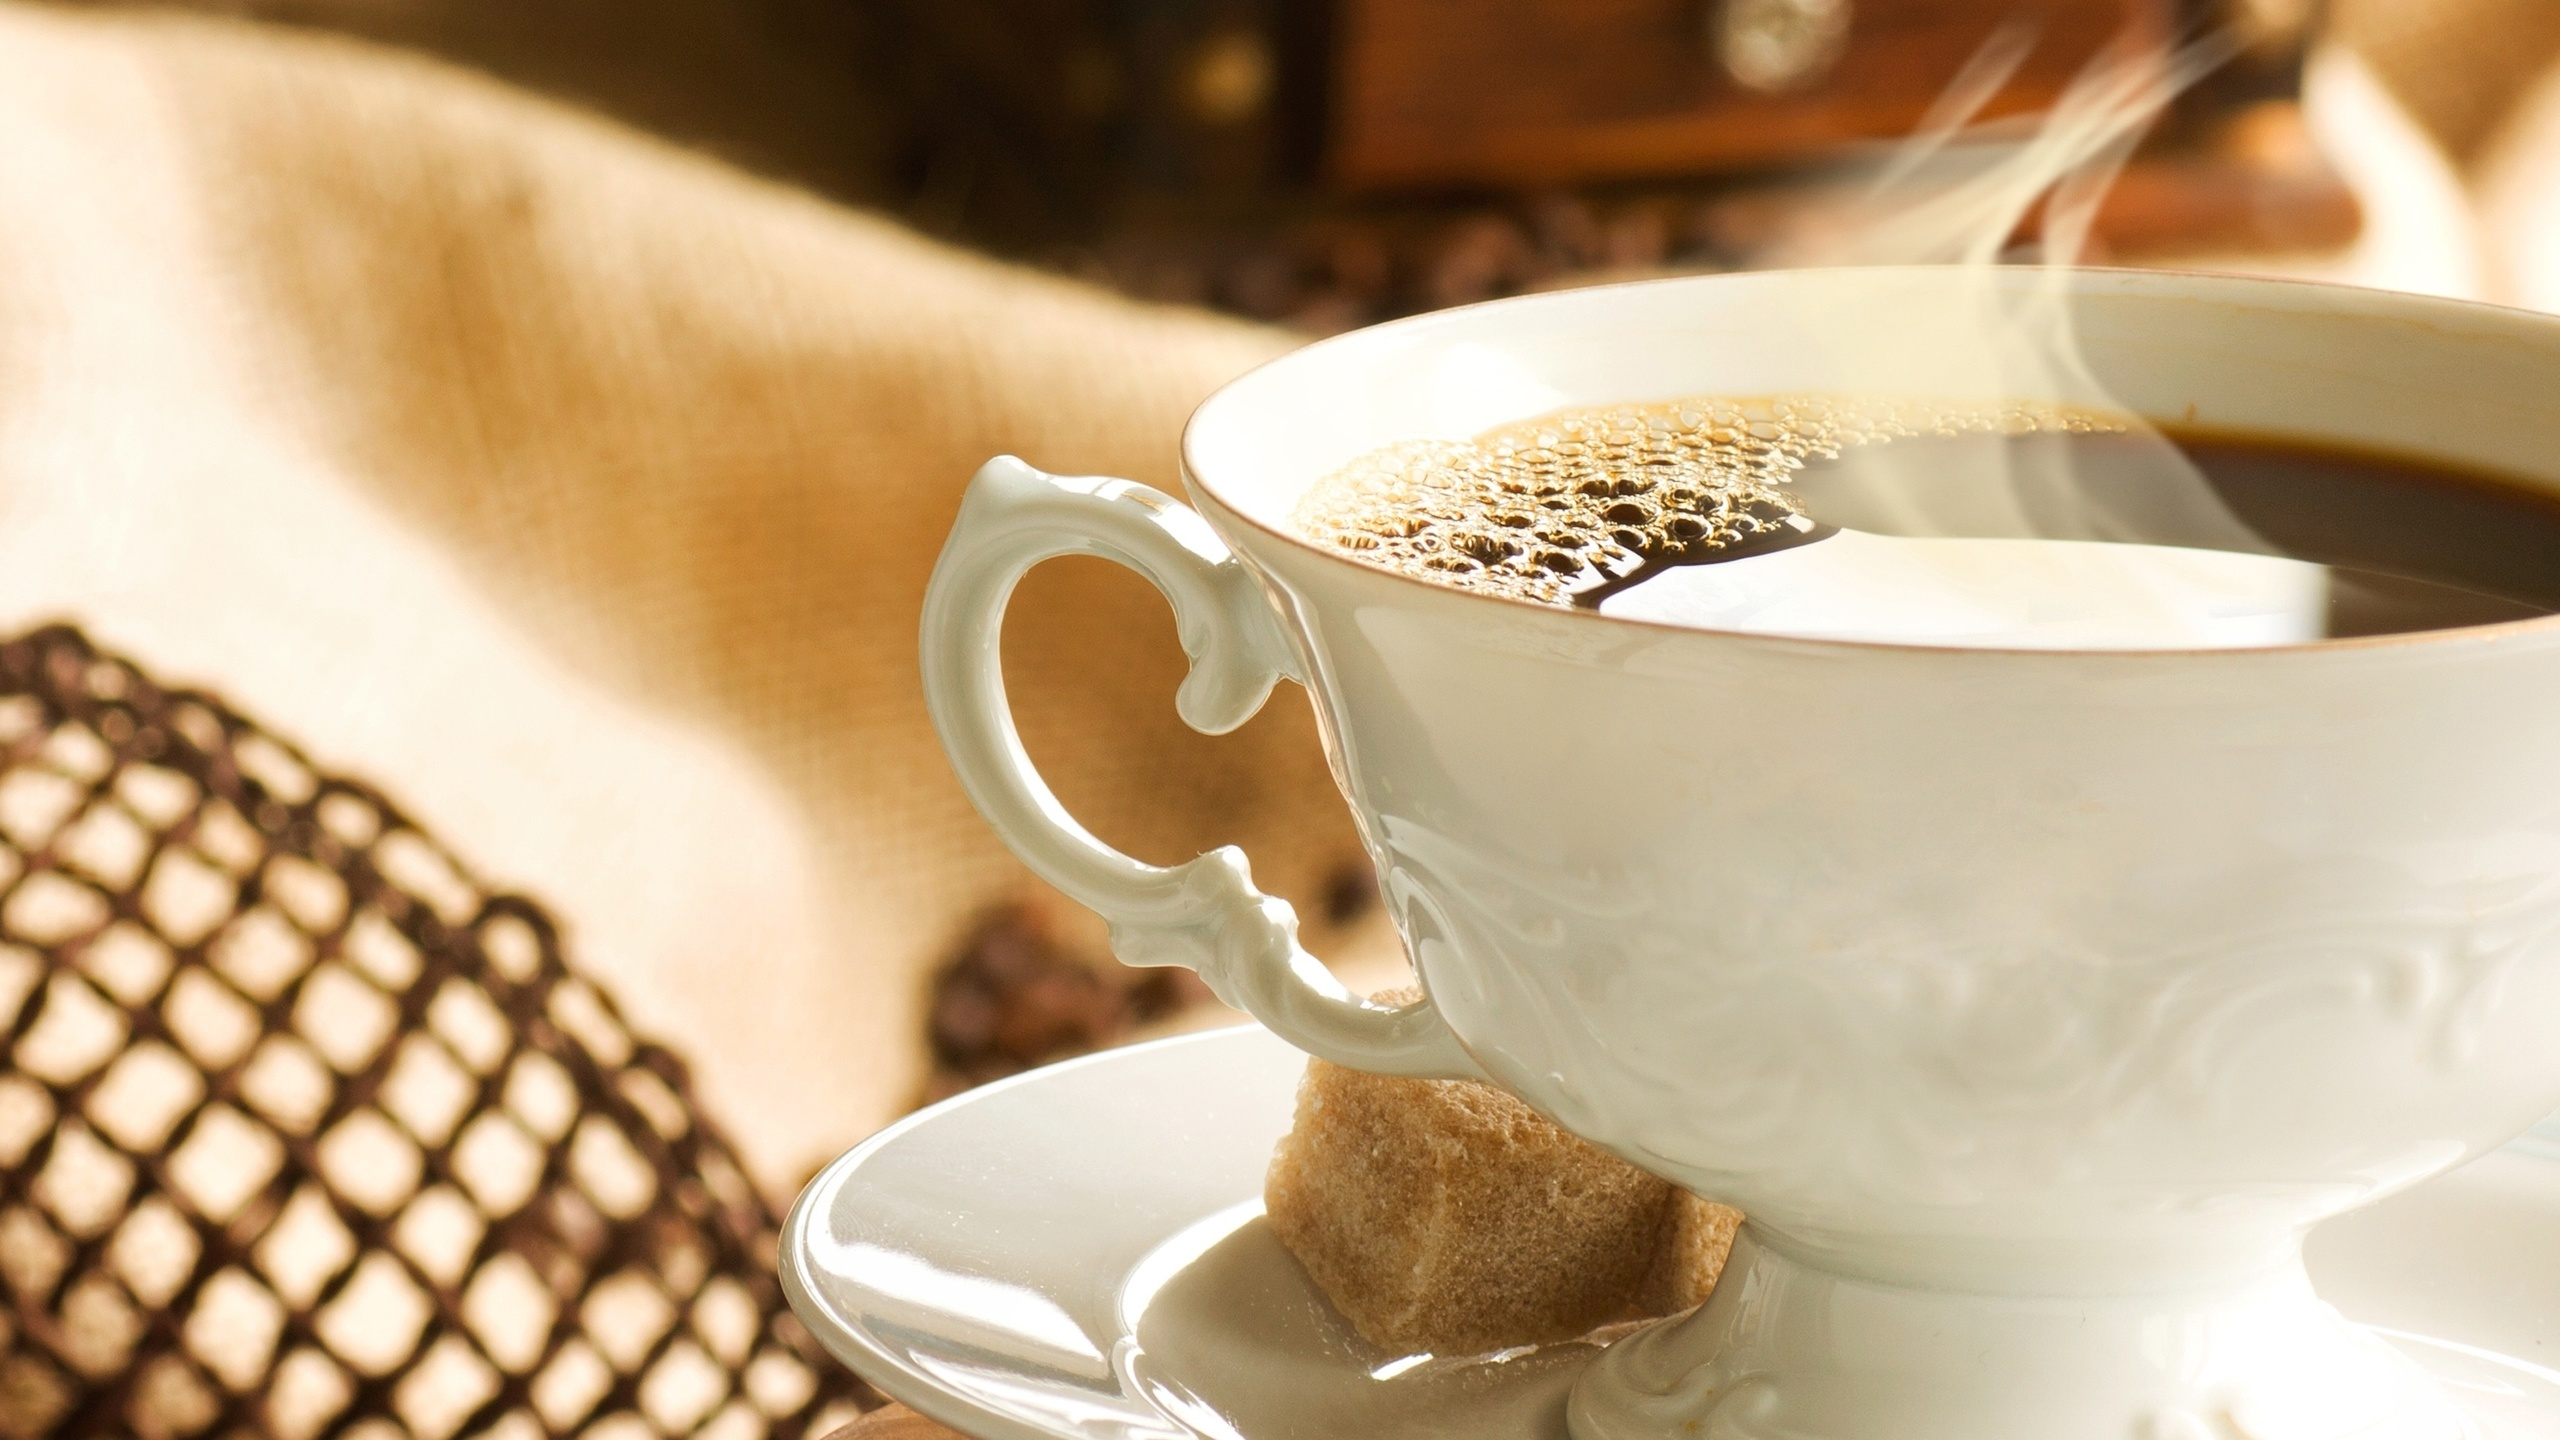 Картинка чашка кофе с паром